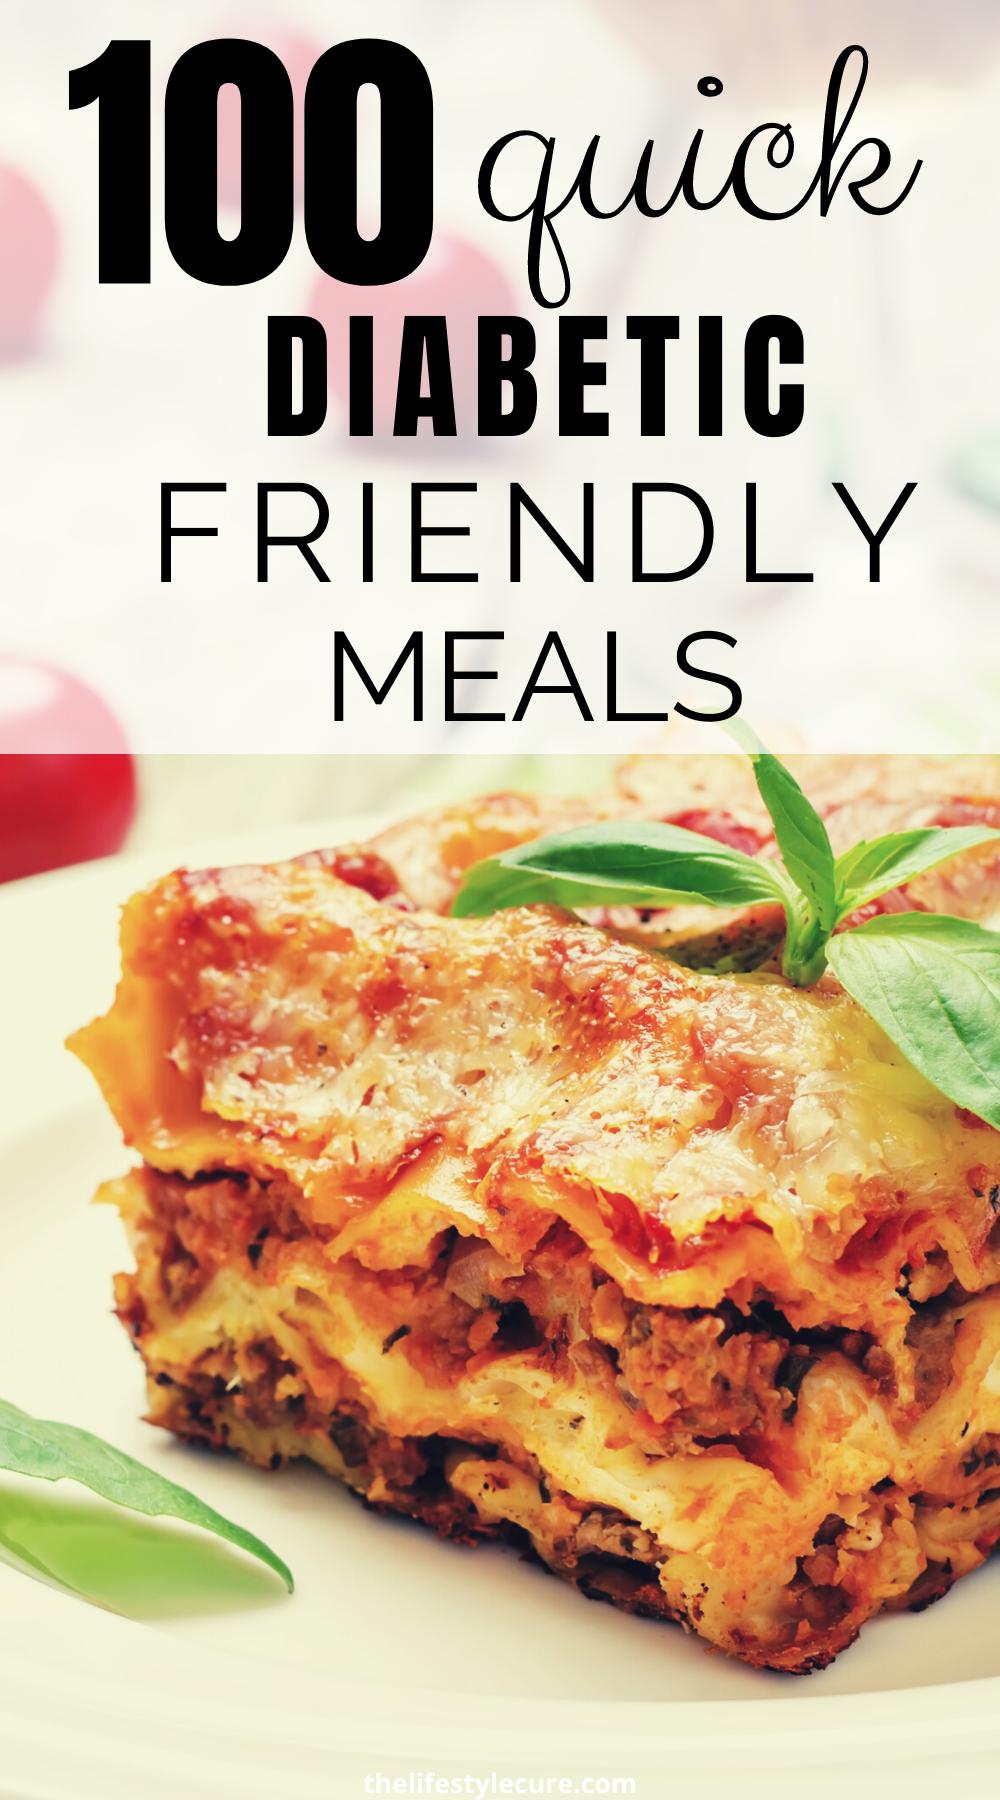 100 Quick Diabetic Friendly Recipes Healthy Recipes For Diabetics Diabetic Diet Recipes Diabetic Friendly Dinner Recipes